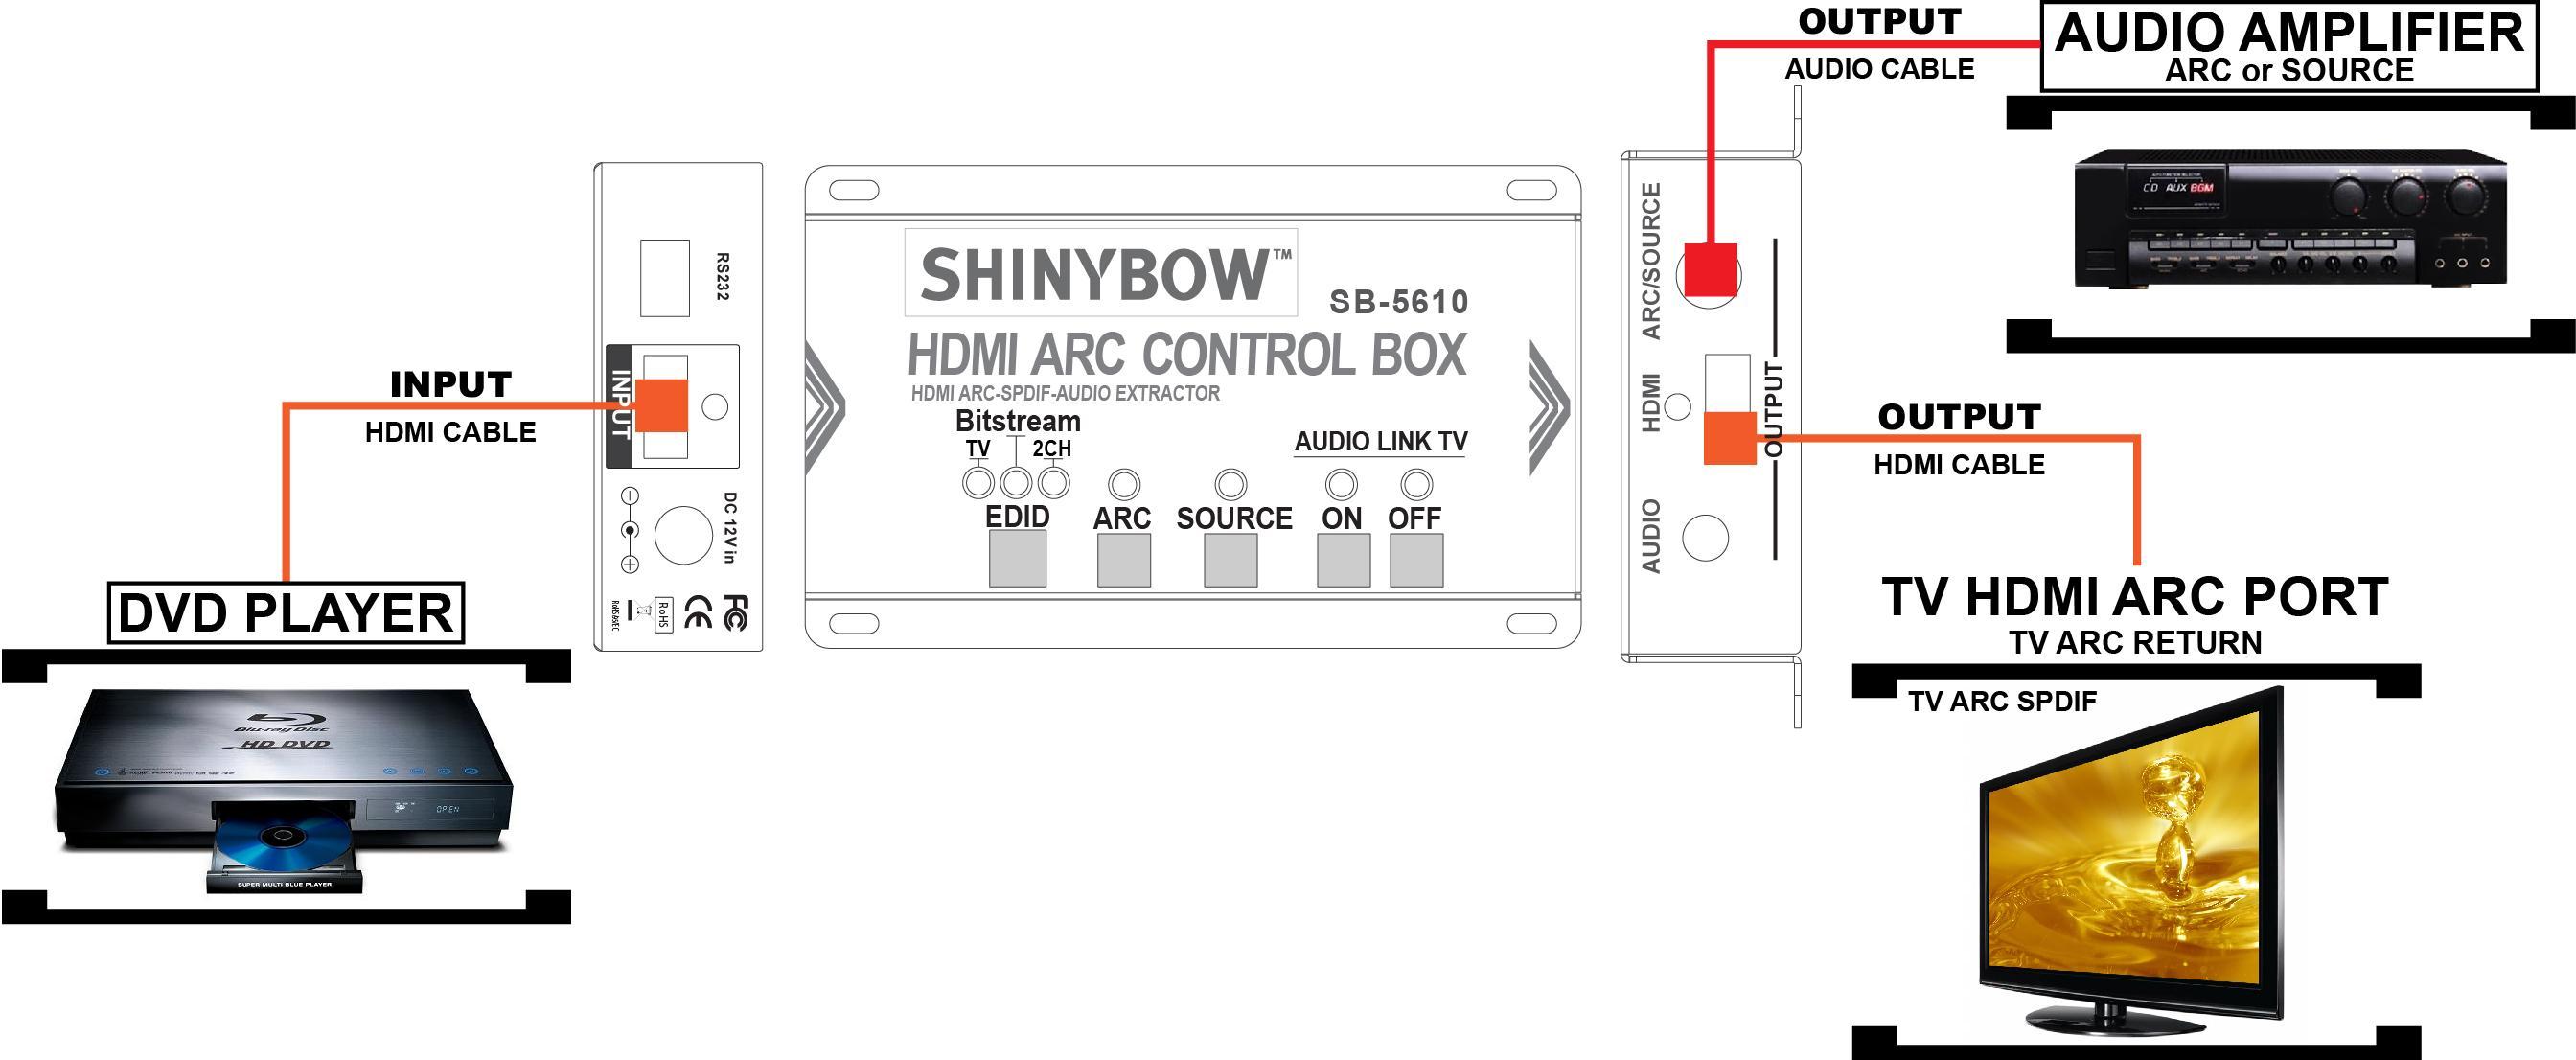 sb 5610 shinybow hdmi audio extractor arc spdif analog. Black Bedroom Furniture Sets. Home Design Ideas